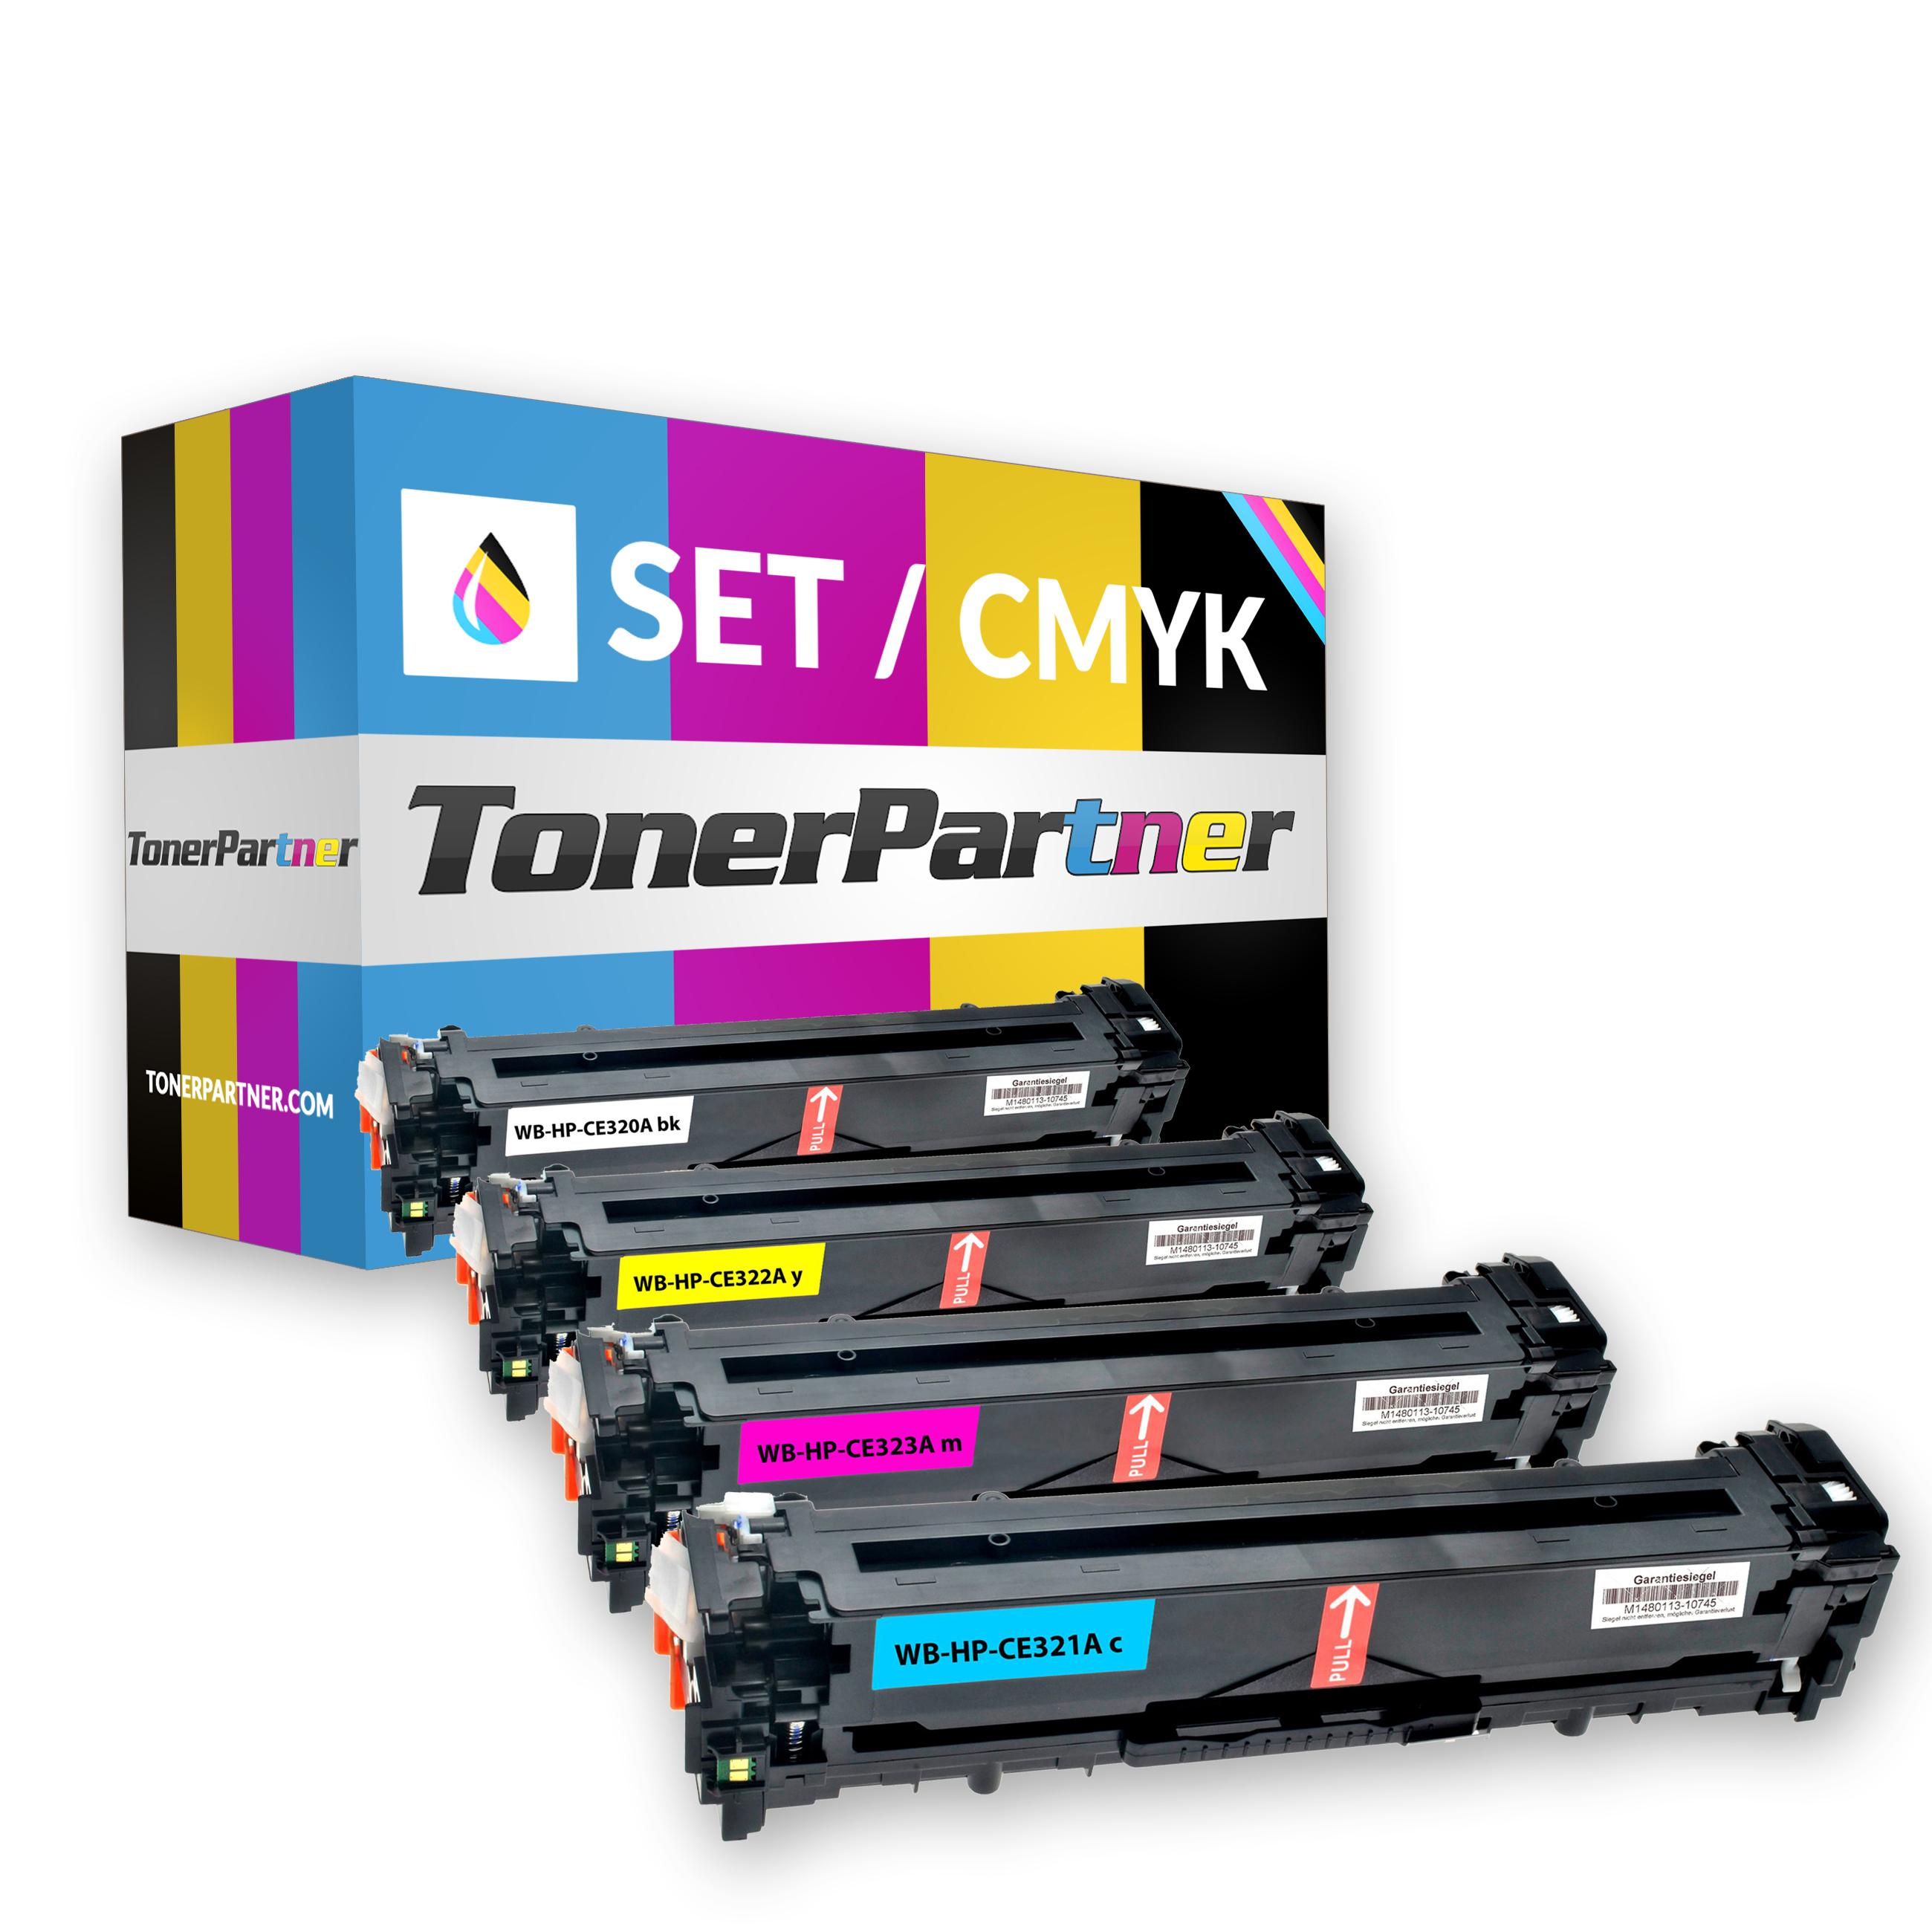 HP CE320A (1x 2.000 Seiten) - CE321A/CE322A/CE323A (3x 1.300 Seiten) Toner MultiPack Kompatibel